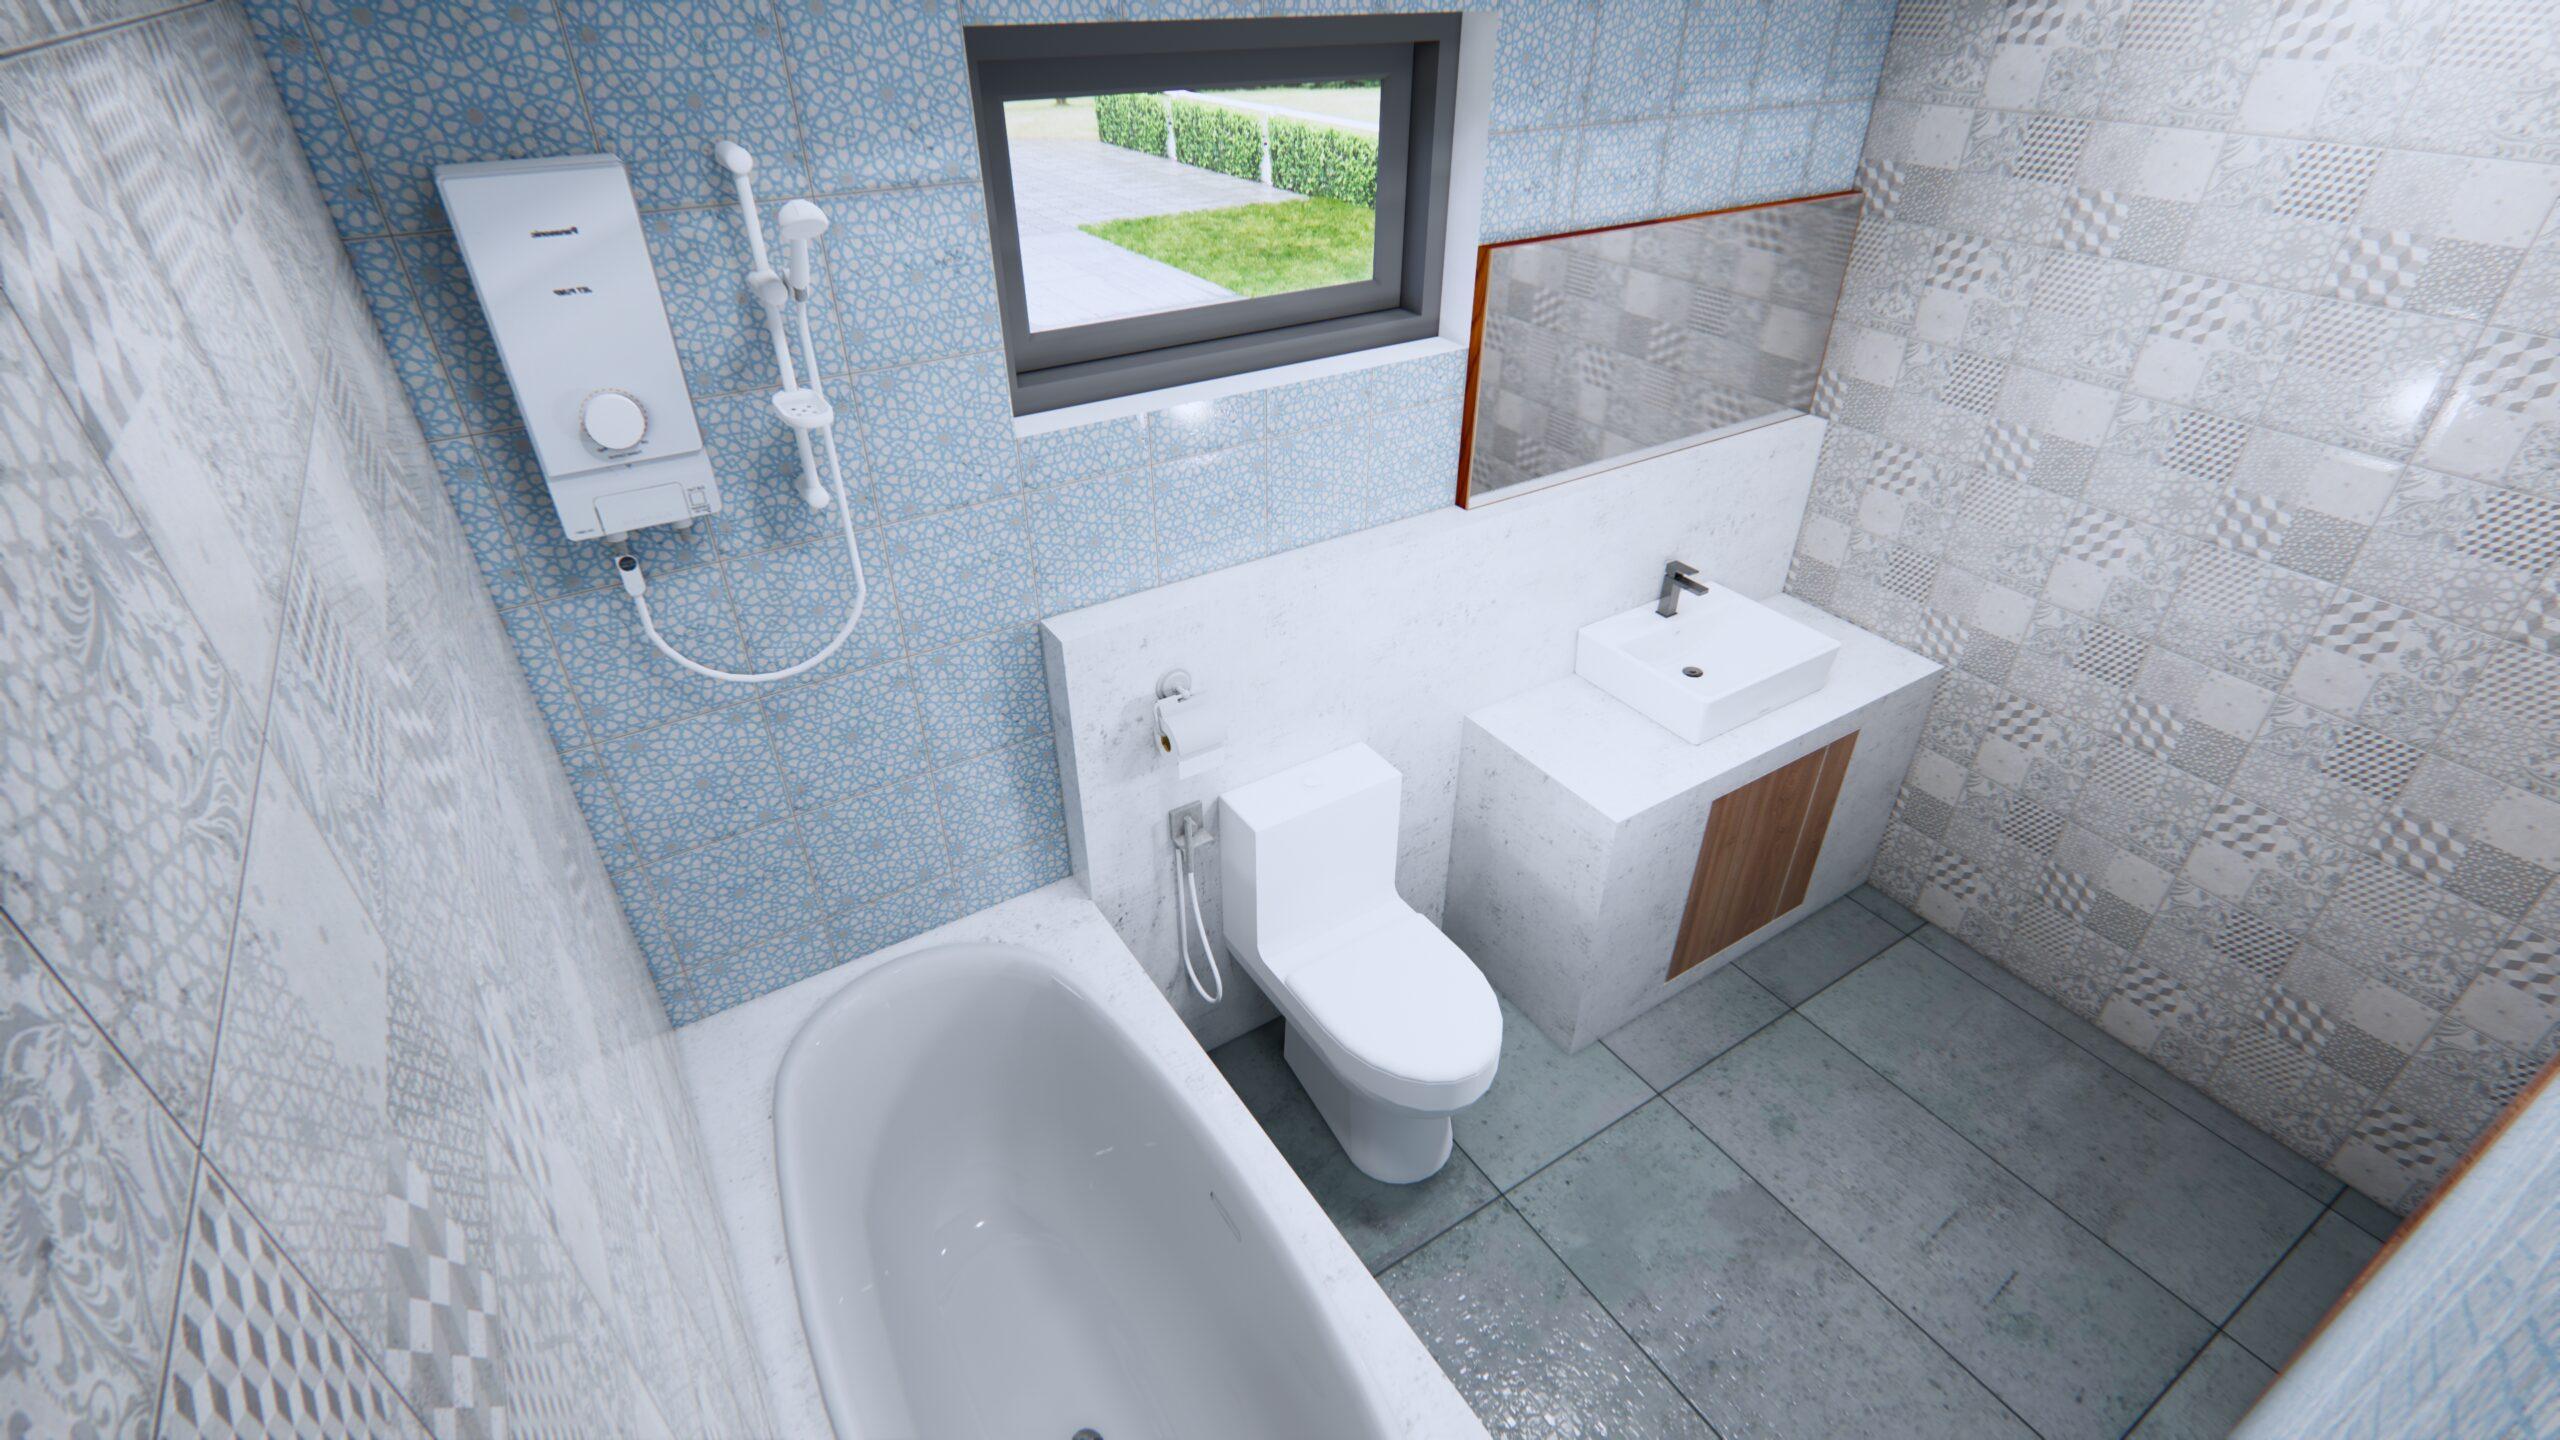 Modern House Drawing 12x9 Meter 40x30 Feet 2 Beds Bathroom 2